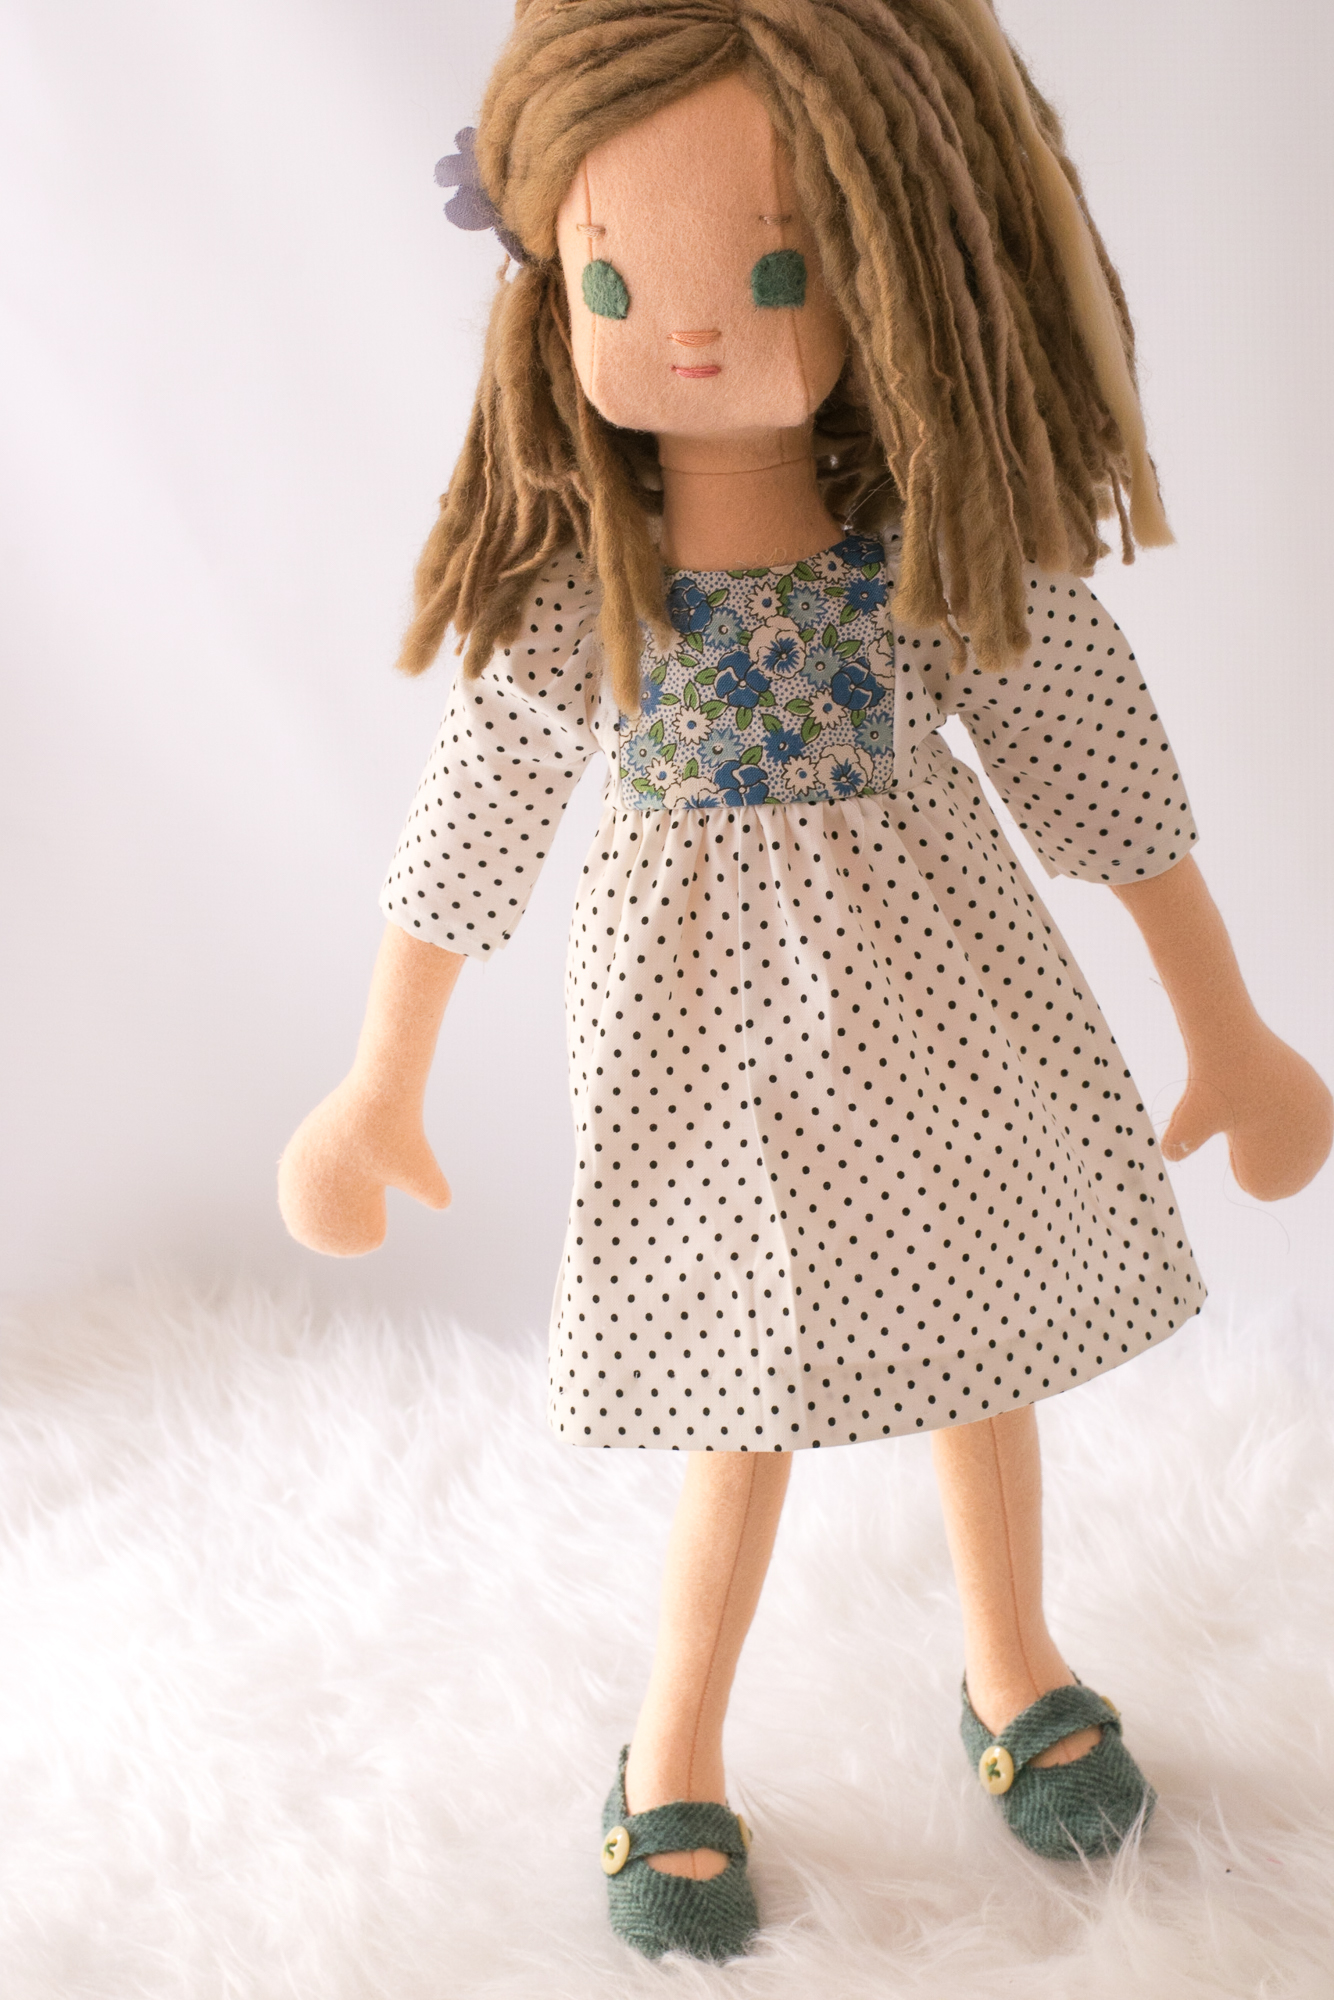 Gallery of Dolls-12.jpg